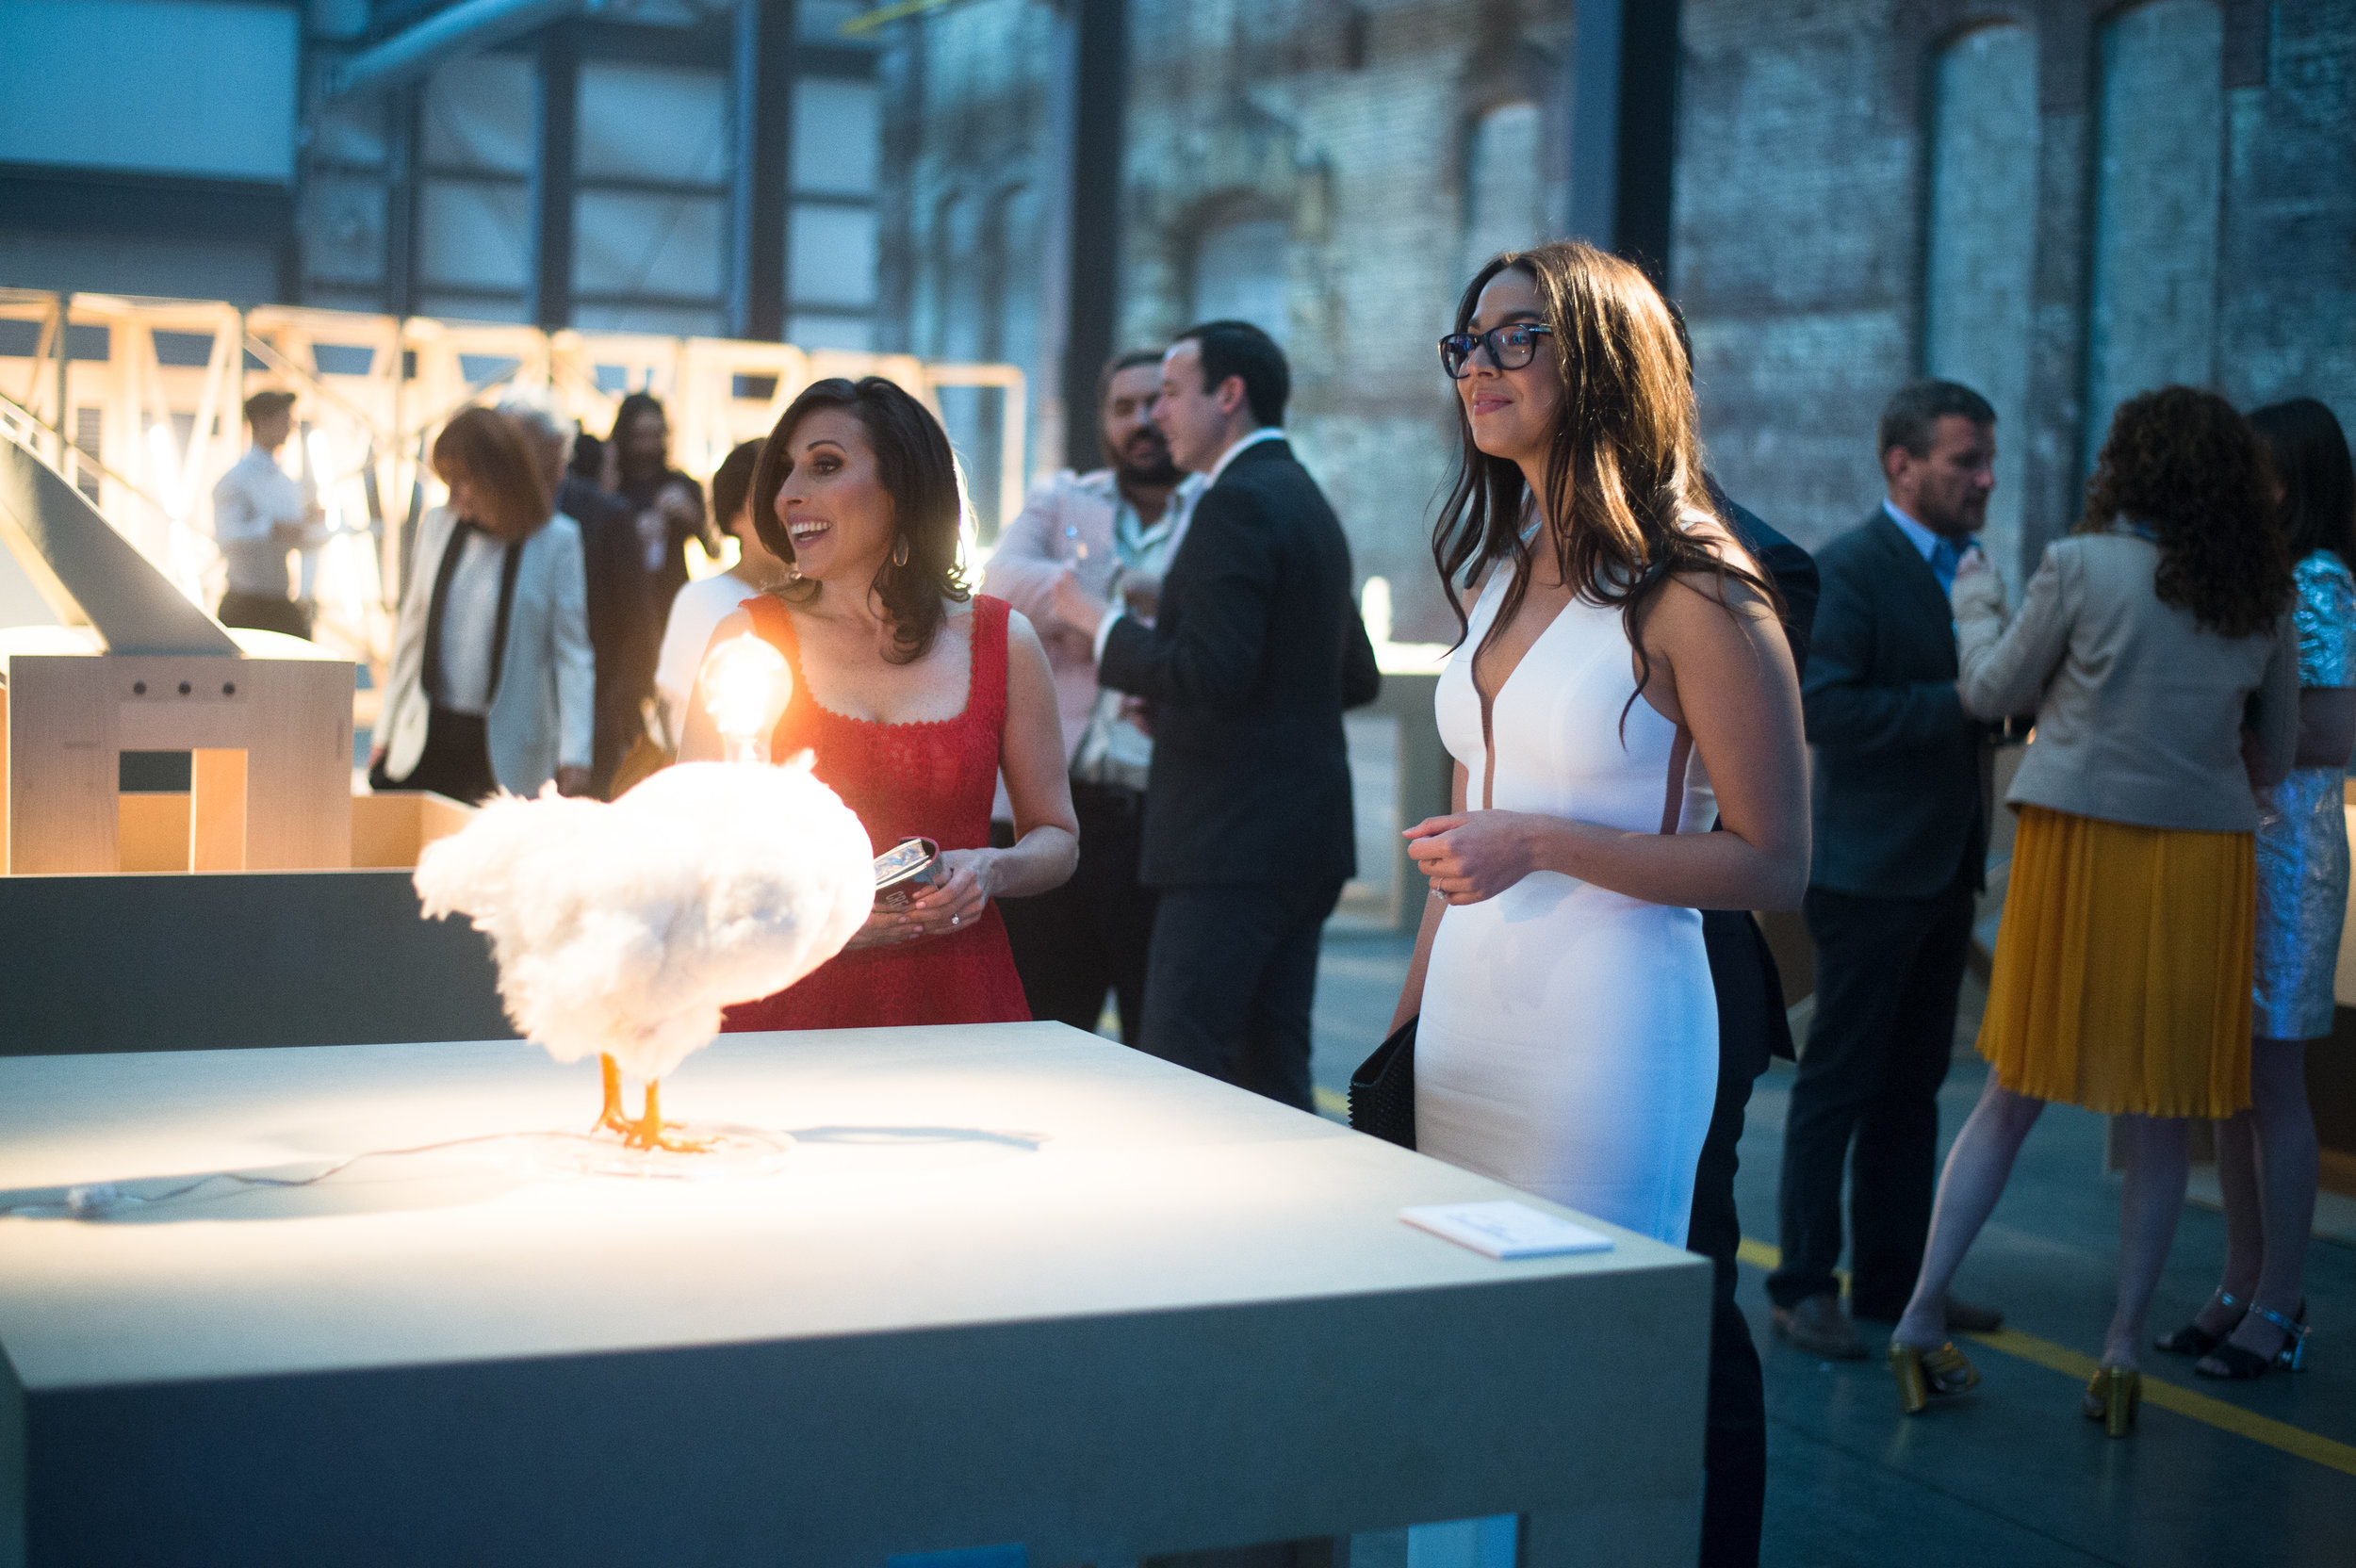 Carolina Alvarez-Mathies with Creative Time's Executive Director Katie Hollander at the Creative Time Gala (2016)